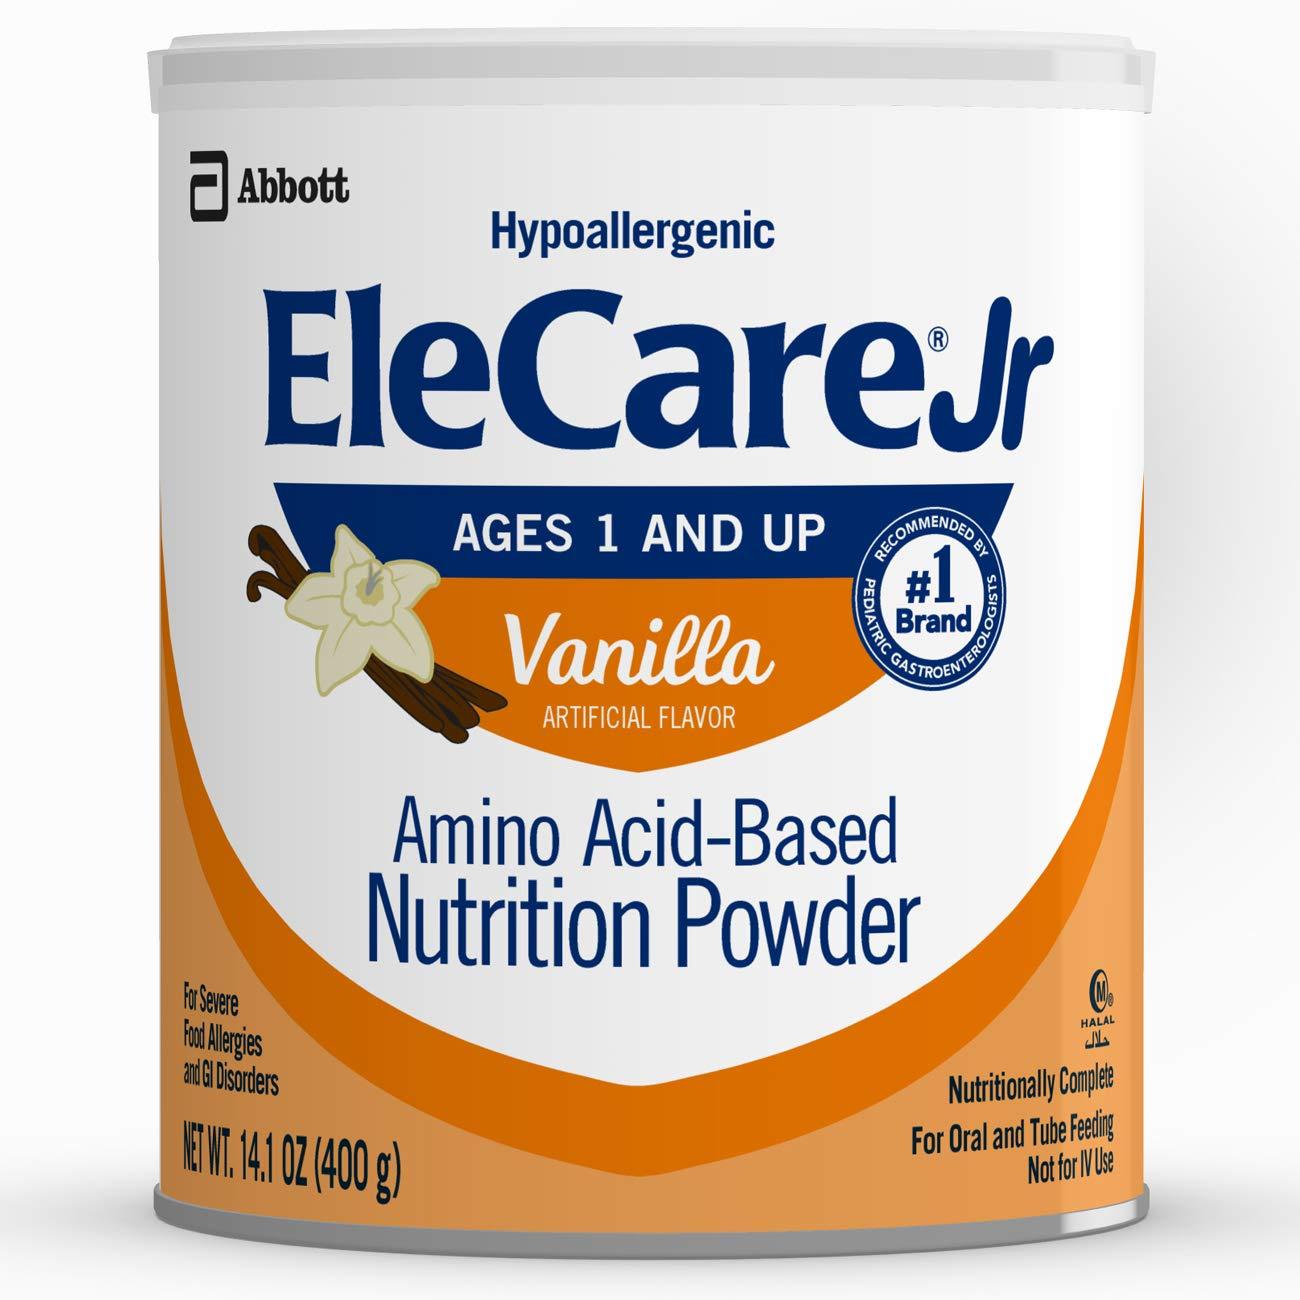 EleCare Elecare Jr Nutrition Powder Amino Acid-Based Nutrition Powder Vanilla (Pack of 6)